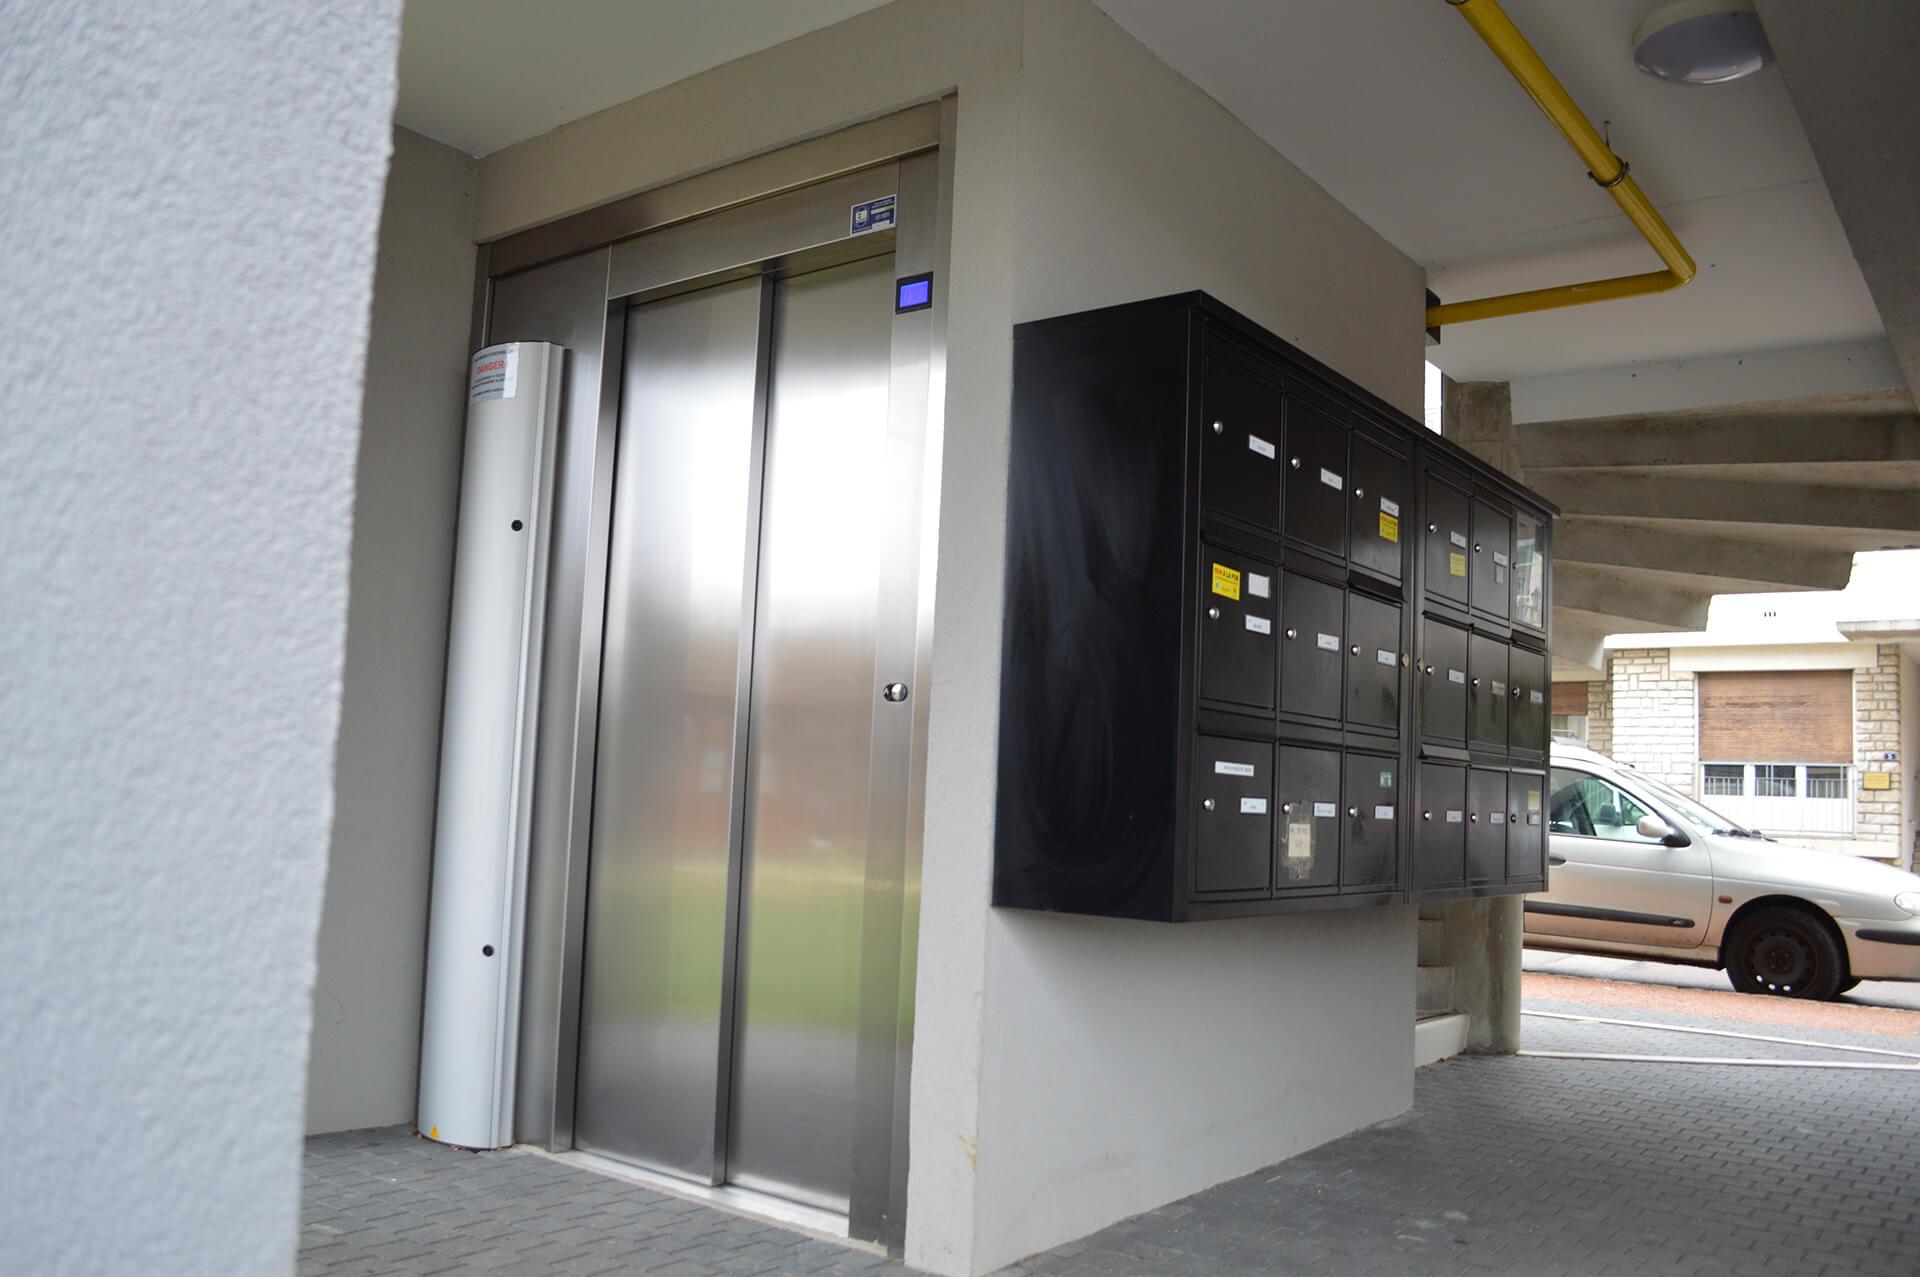 Installation ascenseur numéro 1 Dijon - EM Ascenseurs expert